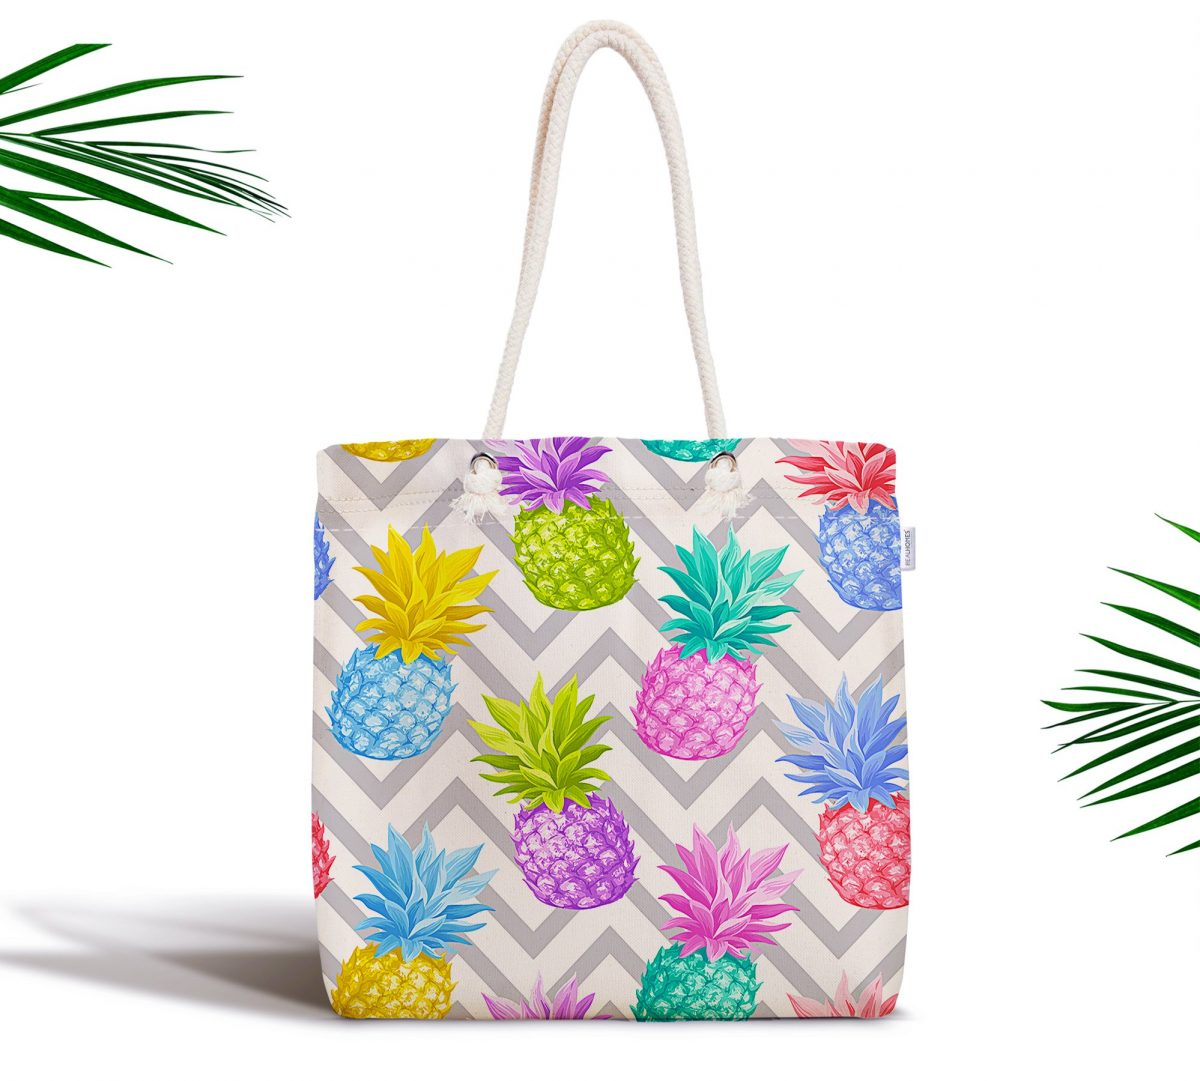 Gri Zigzag Desenli Ananaslar Modern Fermuarlı Kumaş Çanta Realhomes